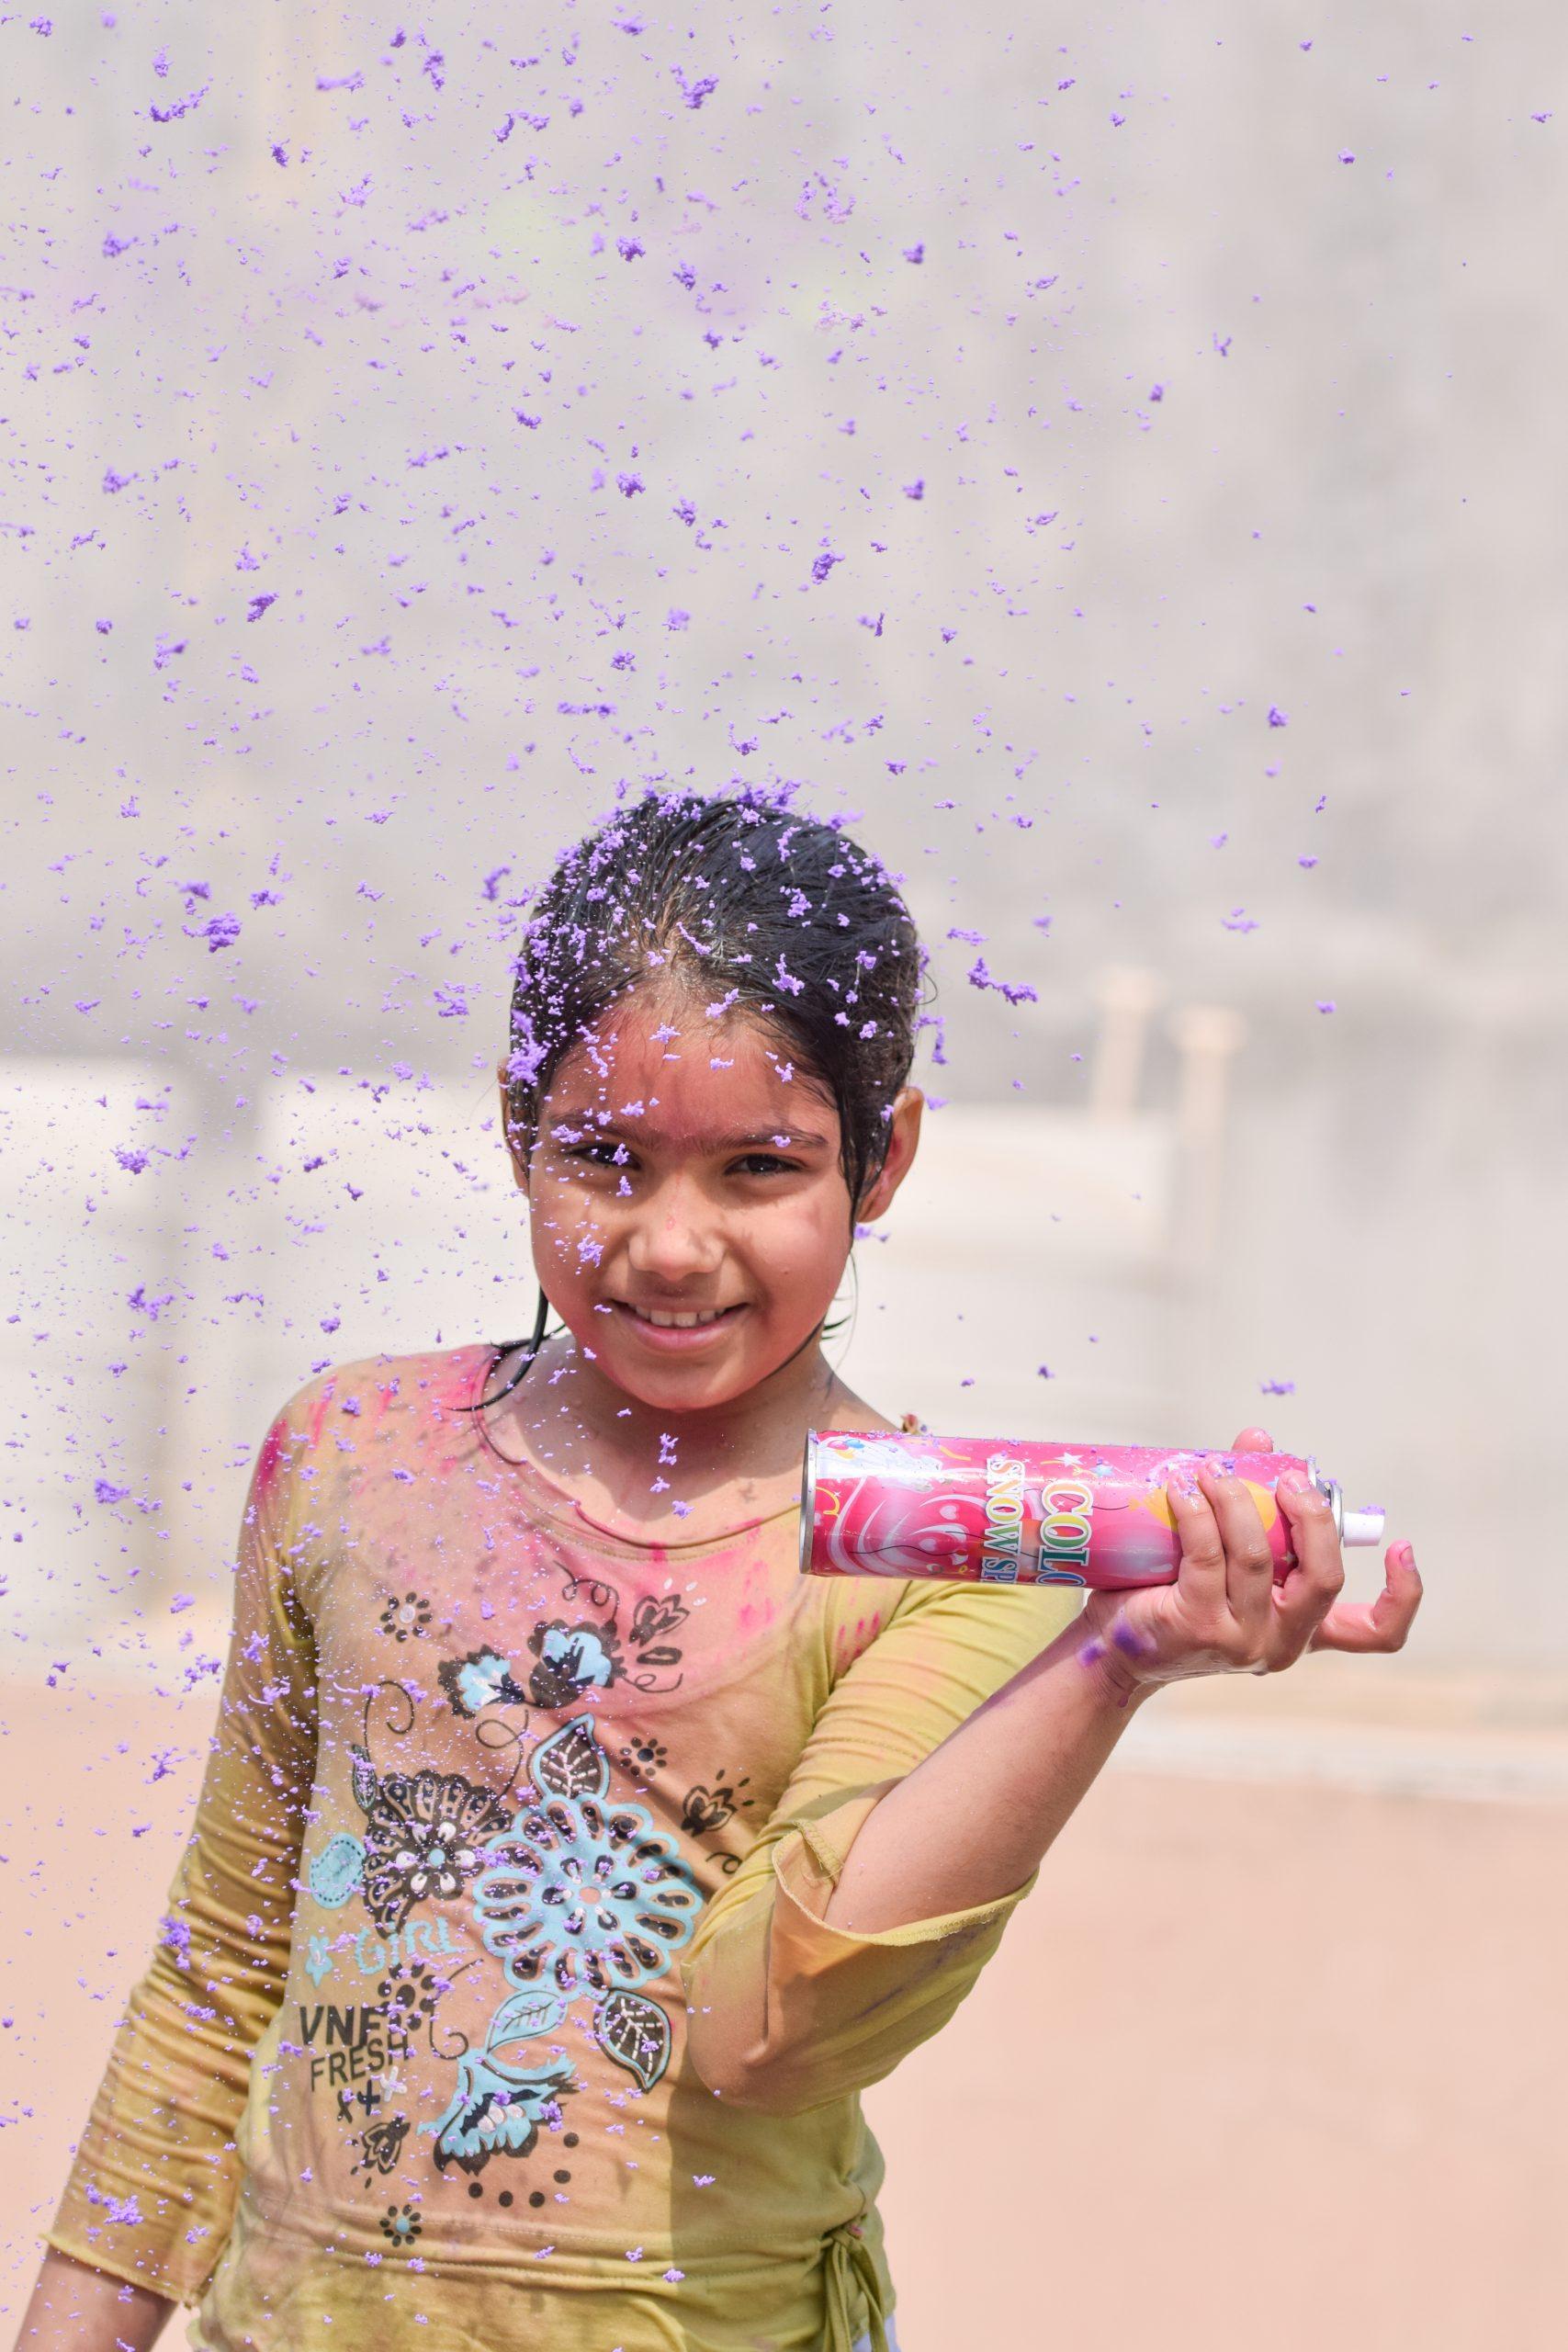 A little girl using foam spray on holi